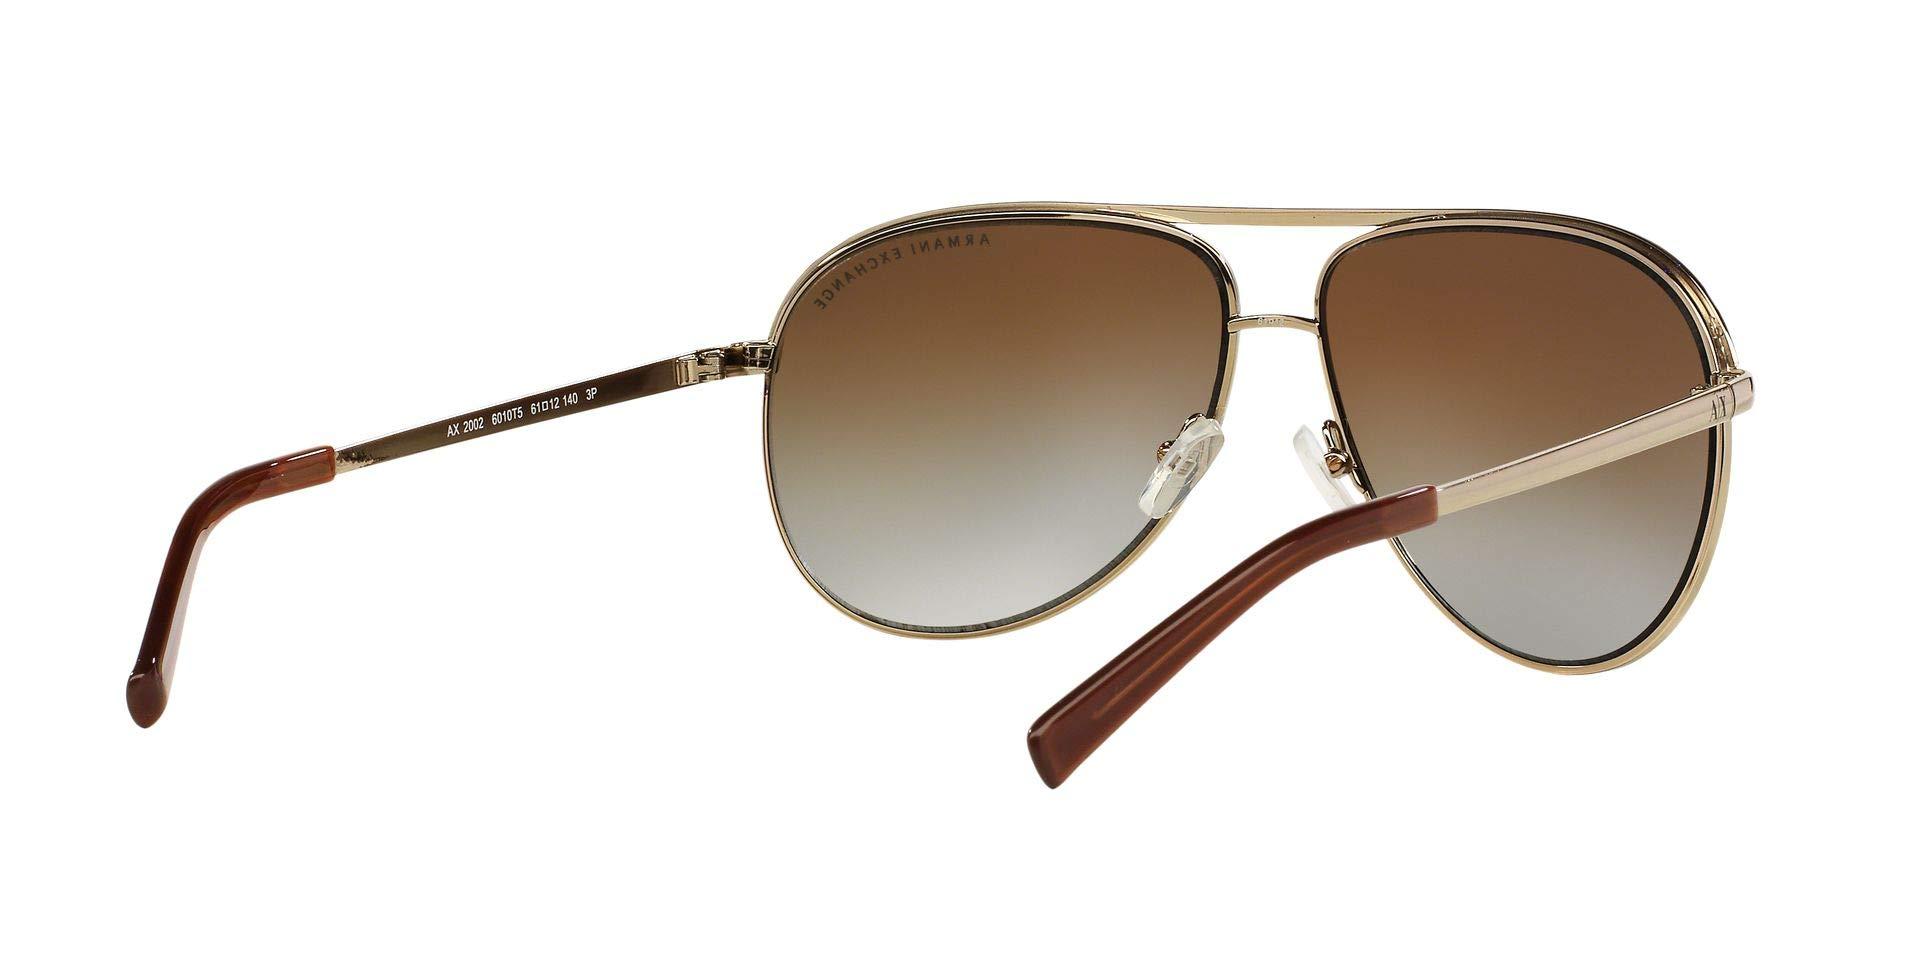 Armani Exchange Metal Unisex Polarized Aviator Sunglasses, Light Gold/Dark Brown, 61 mm by A|X Armani Exchange (Image #9)